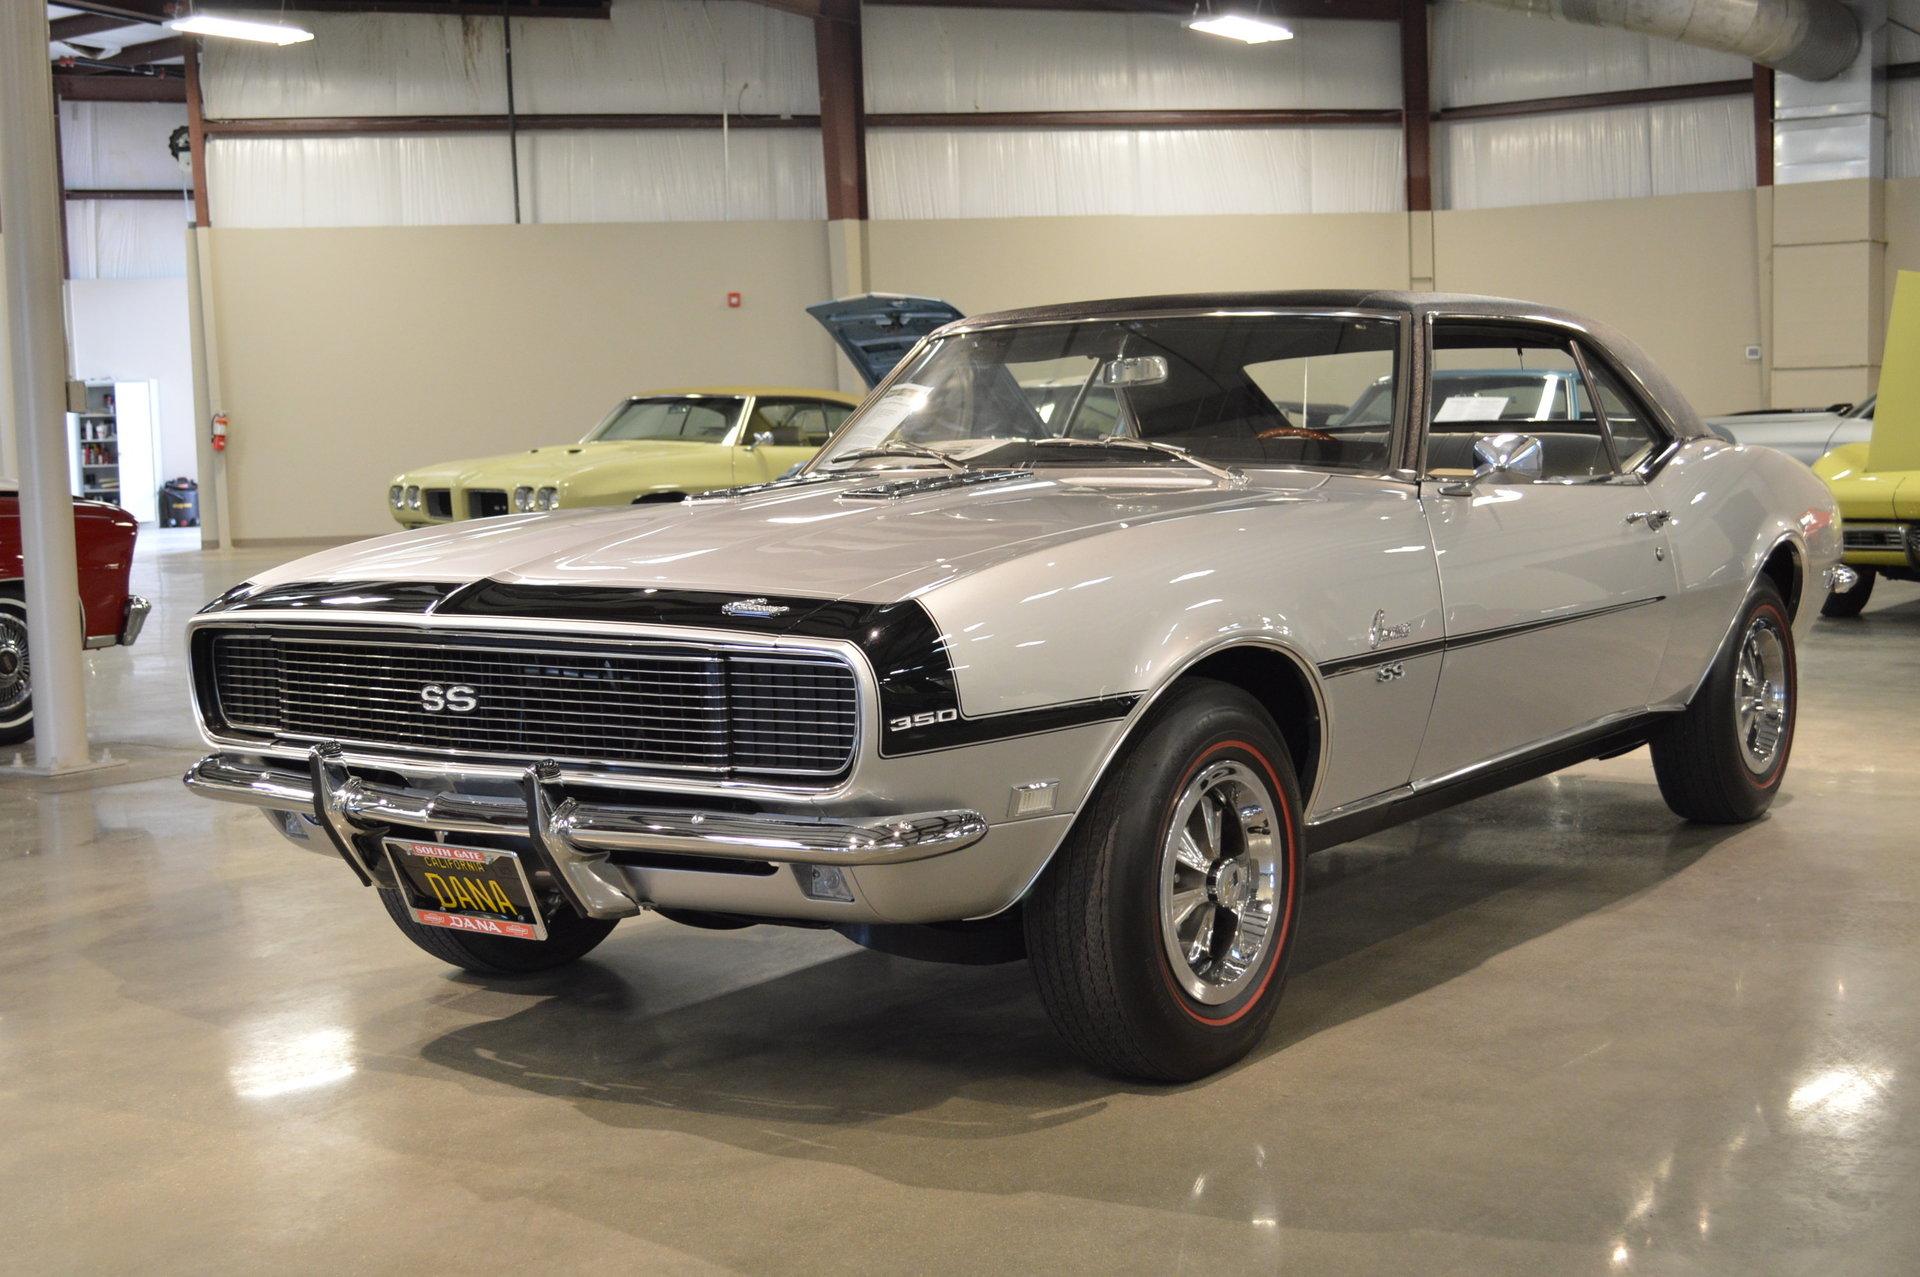 1968 Chevrolet Camaro Leaded Gas Classics Chevy Muscle Car Interior 15628cb461c8 Hd Dana